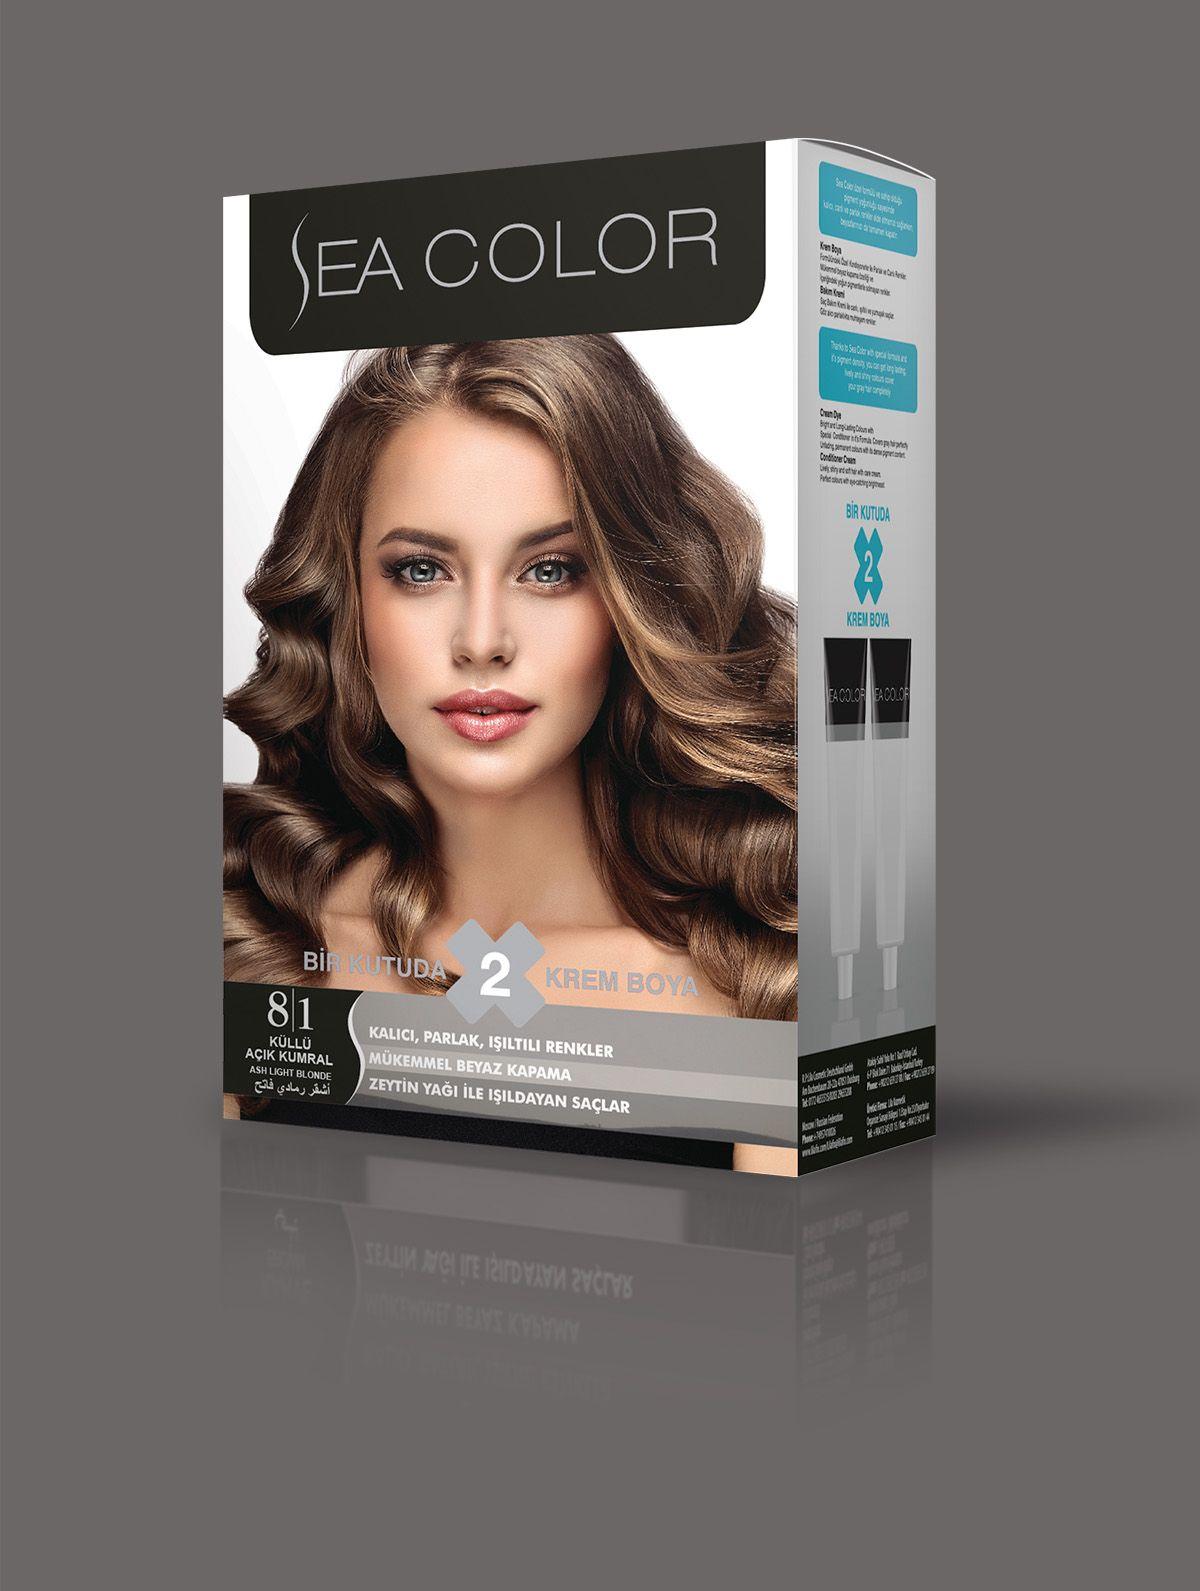 Sea Color Sac Boyasi 8 1 Kullu Acik Kumral 2020 Sac Boyasi